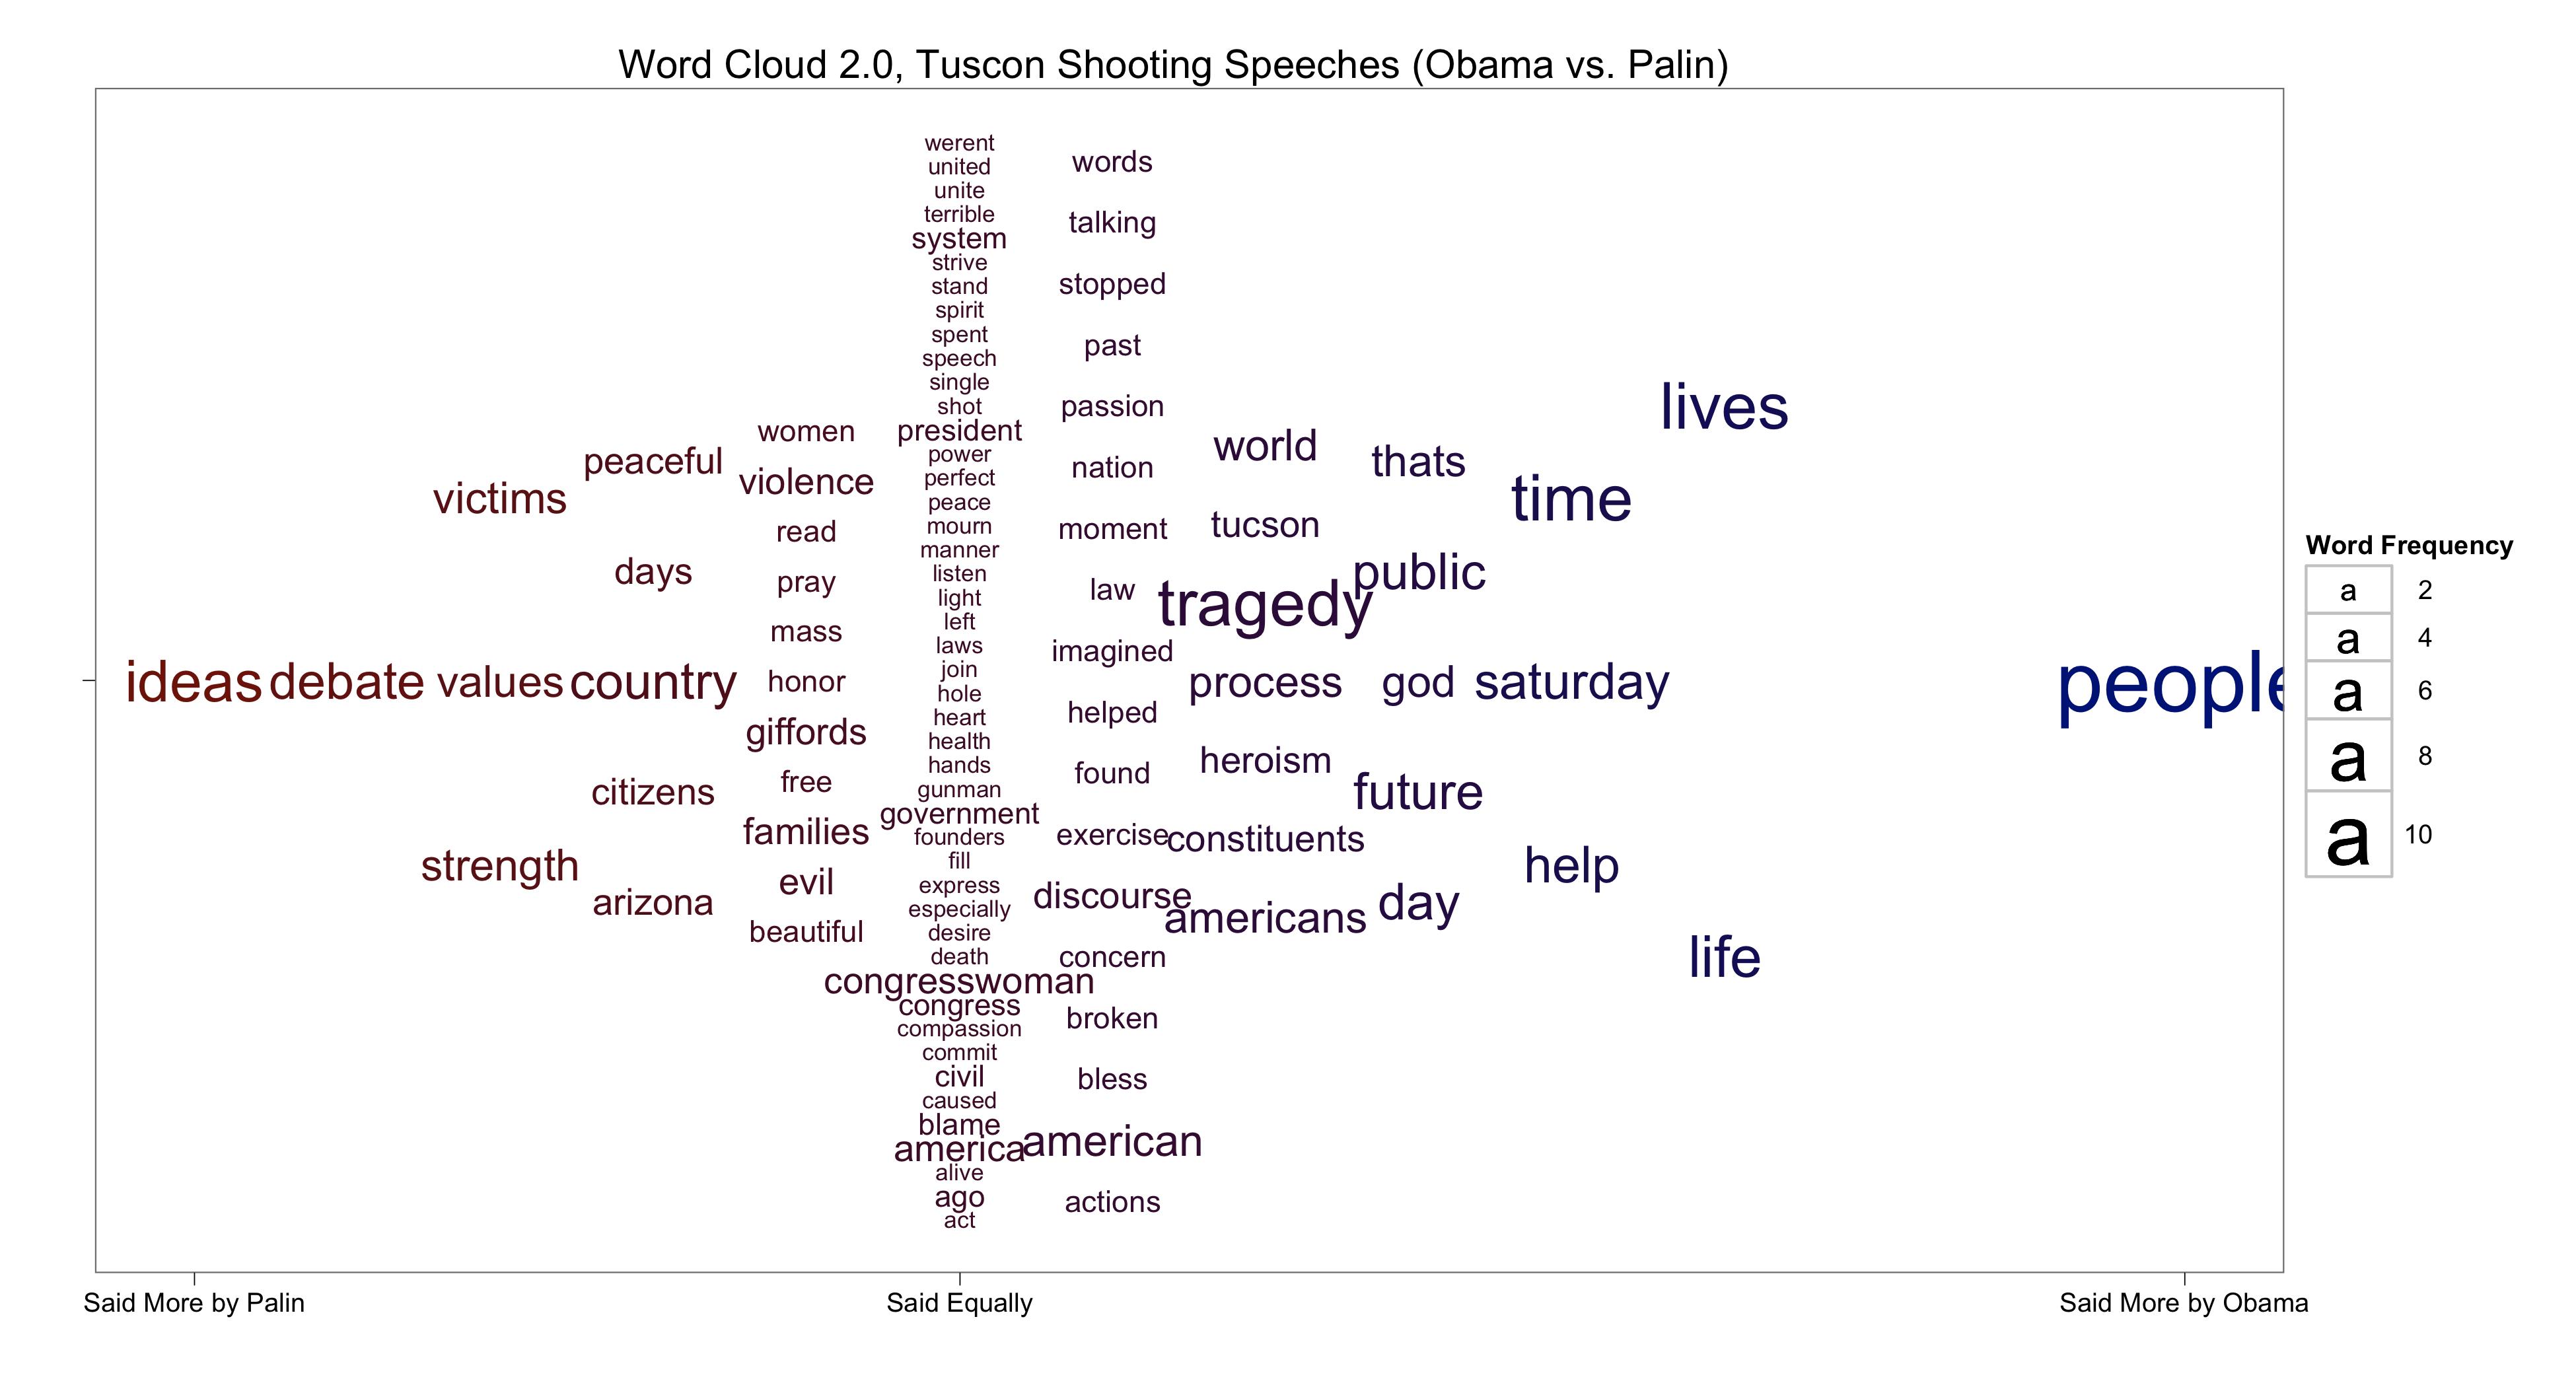 Word Cloud 2.0, Tucson Shooting Speeches (Obama vs. Palin)